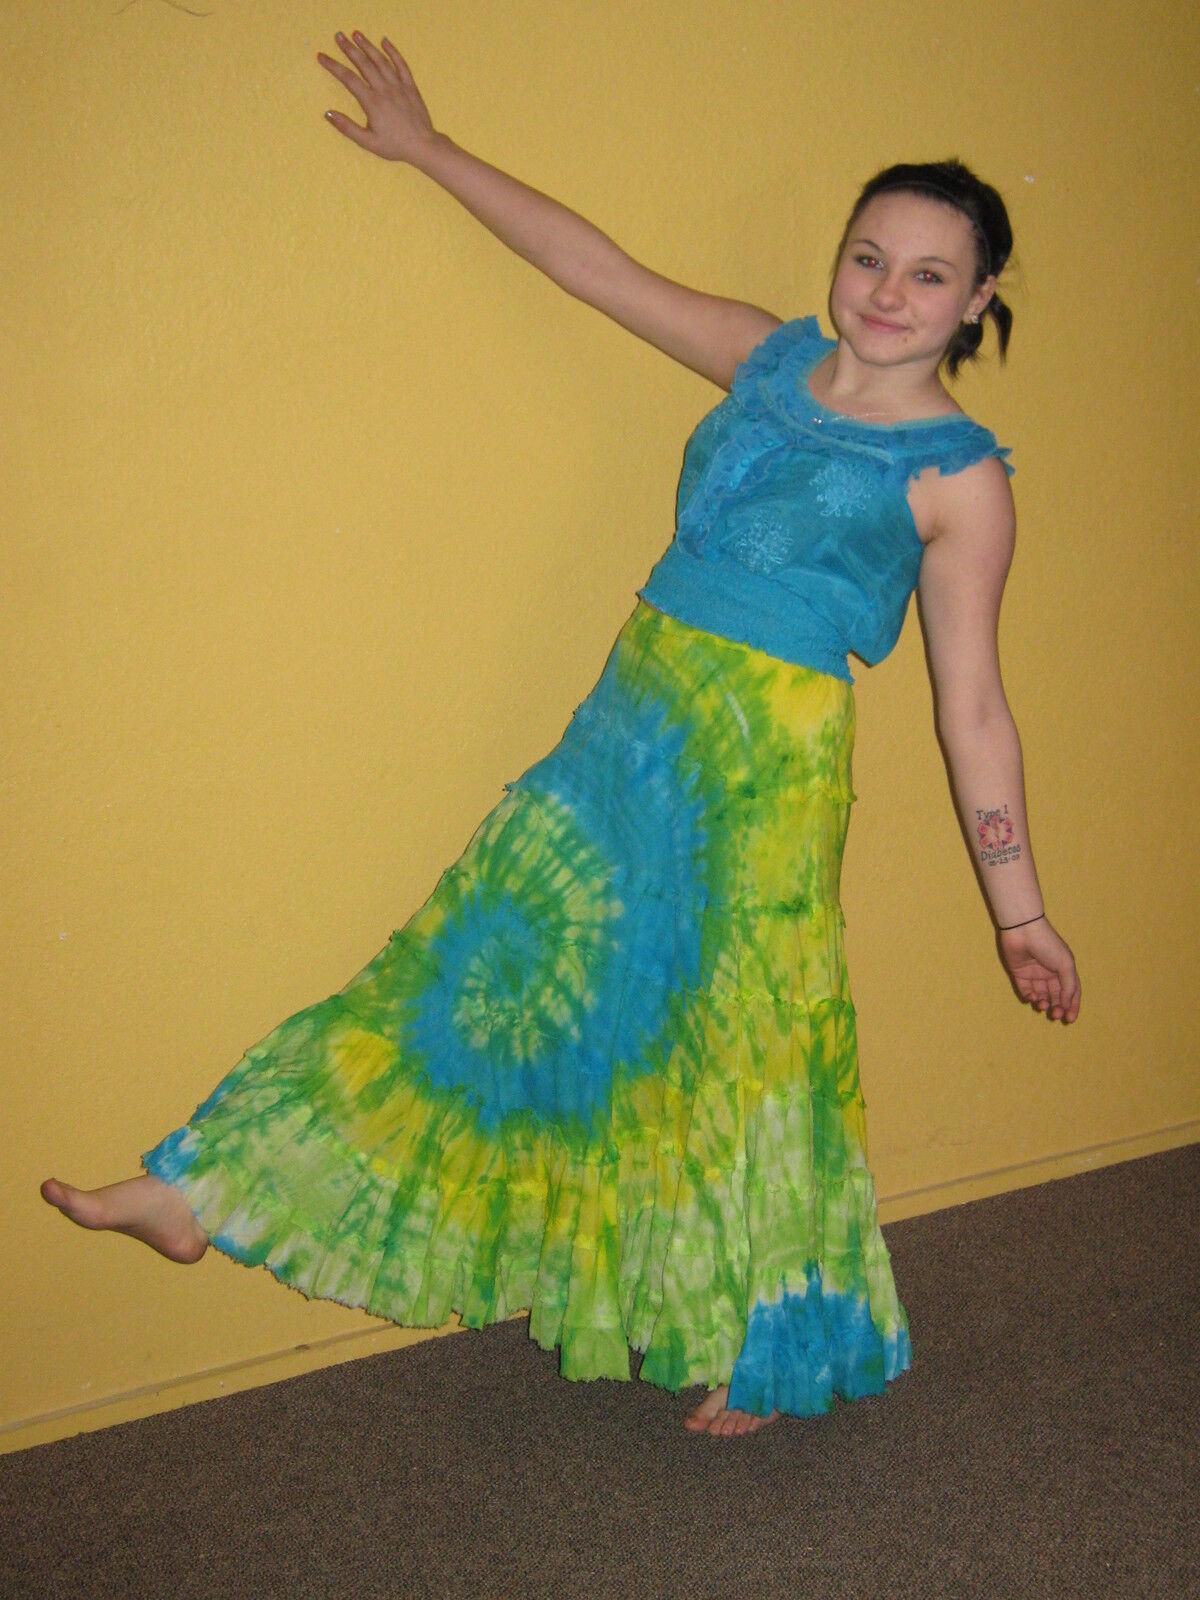 SOLITAIRE Skirt Boho Peasant Gypsy Tie Dye Cotton Gauze Uno Core Top Sz M  CL11